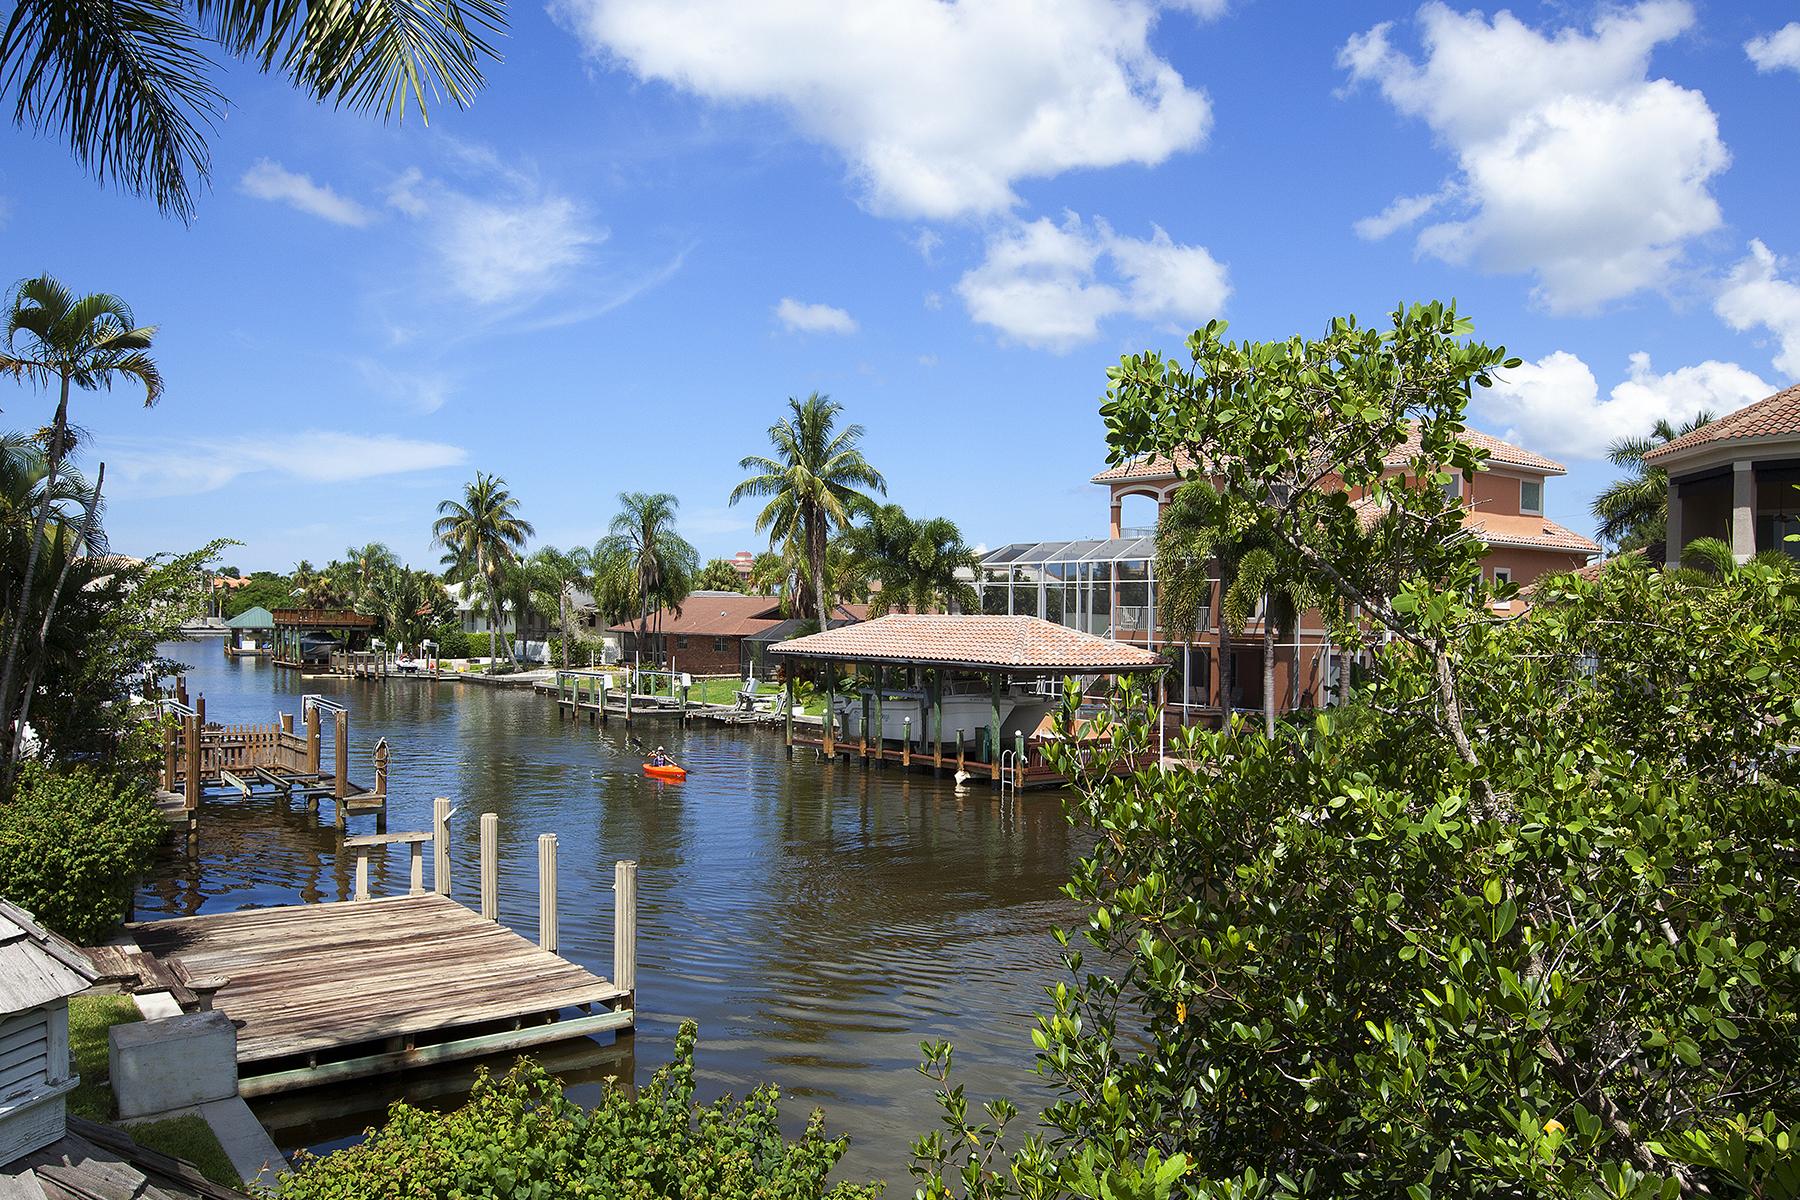 Terreno per Vendita alle ore VANDERBILT - CONNORS 467 Seagull Ave Naples, Florida 34108 Stati Uniti